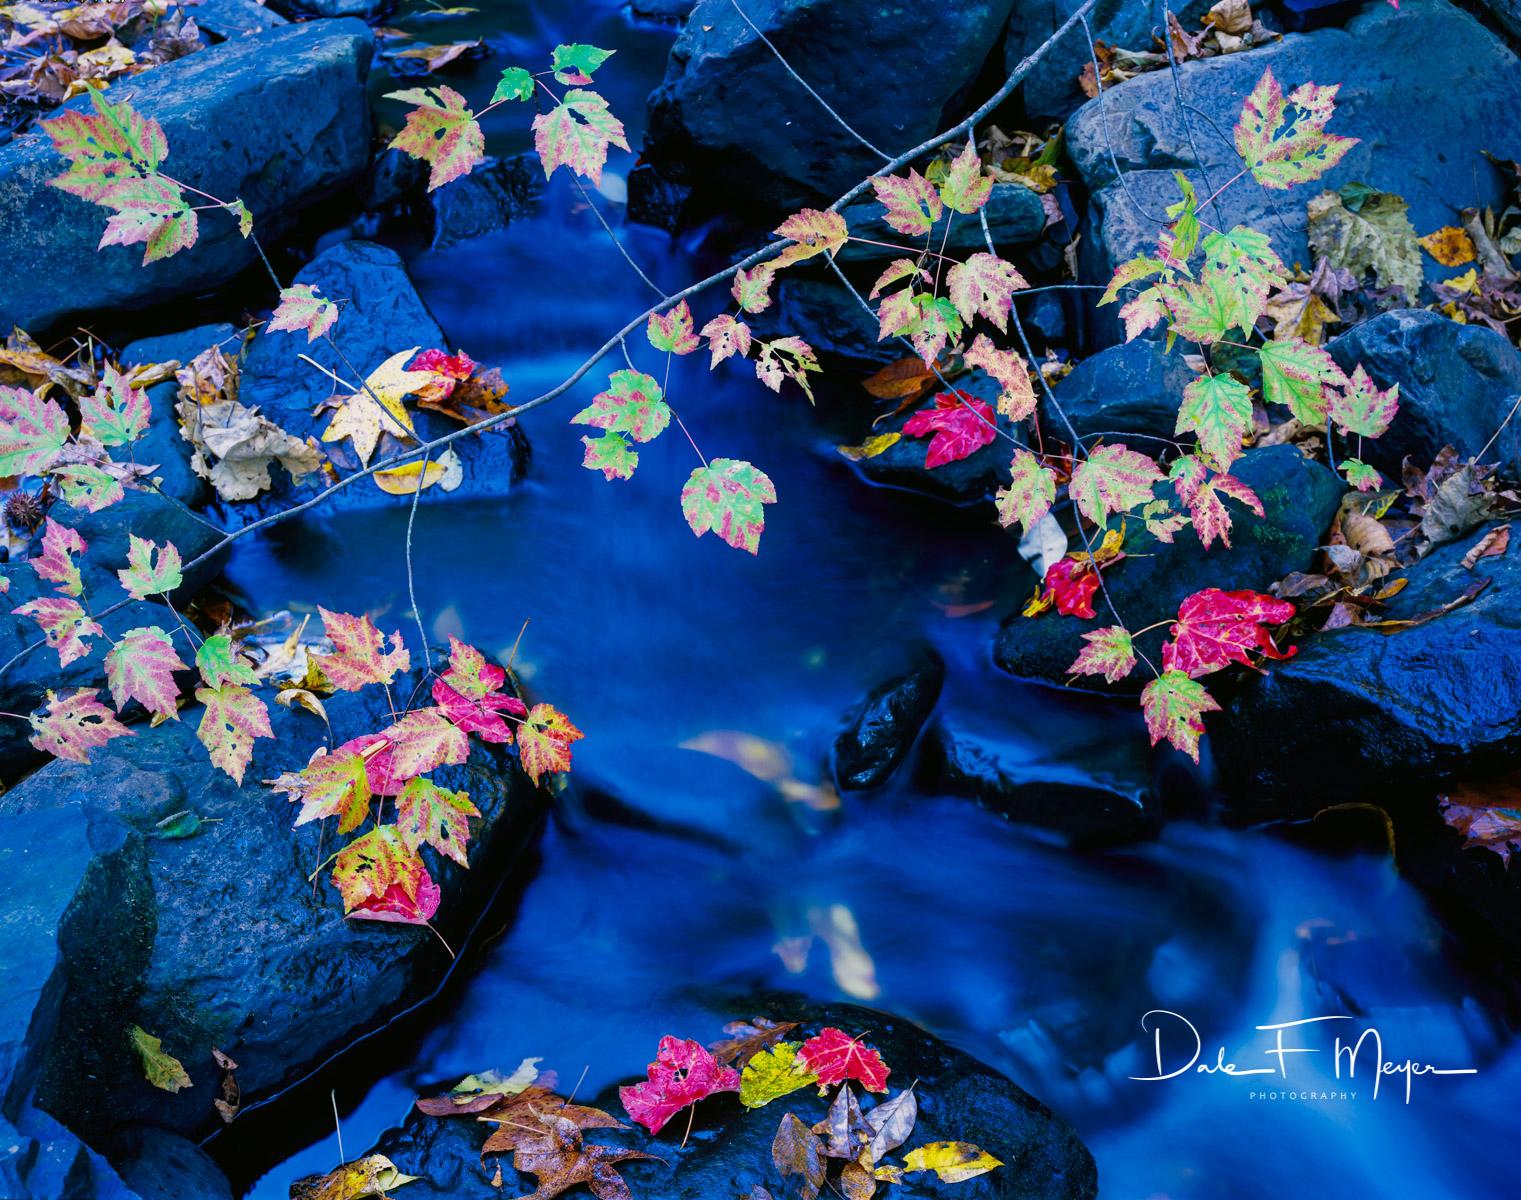 Buffalo River North Arkansas,Upper Buffalo Wilderness Area,fall,rocks and running water, Leafs, Scanned Large Format 4x5 Fuji 50 Velvia., photo